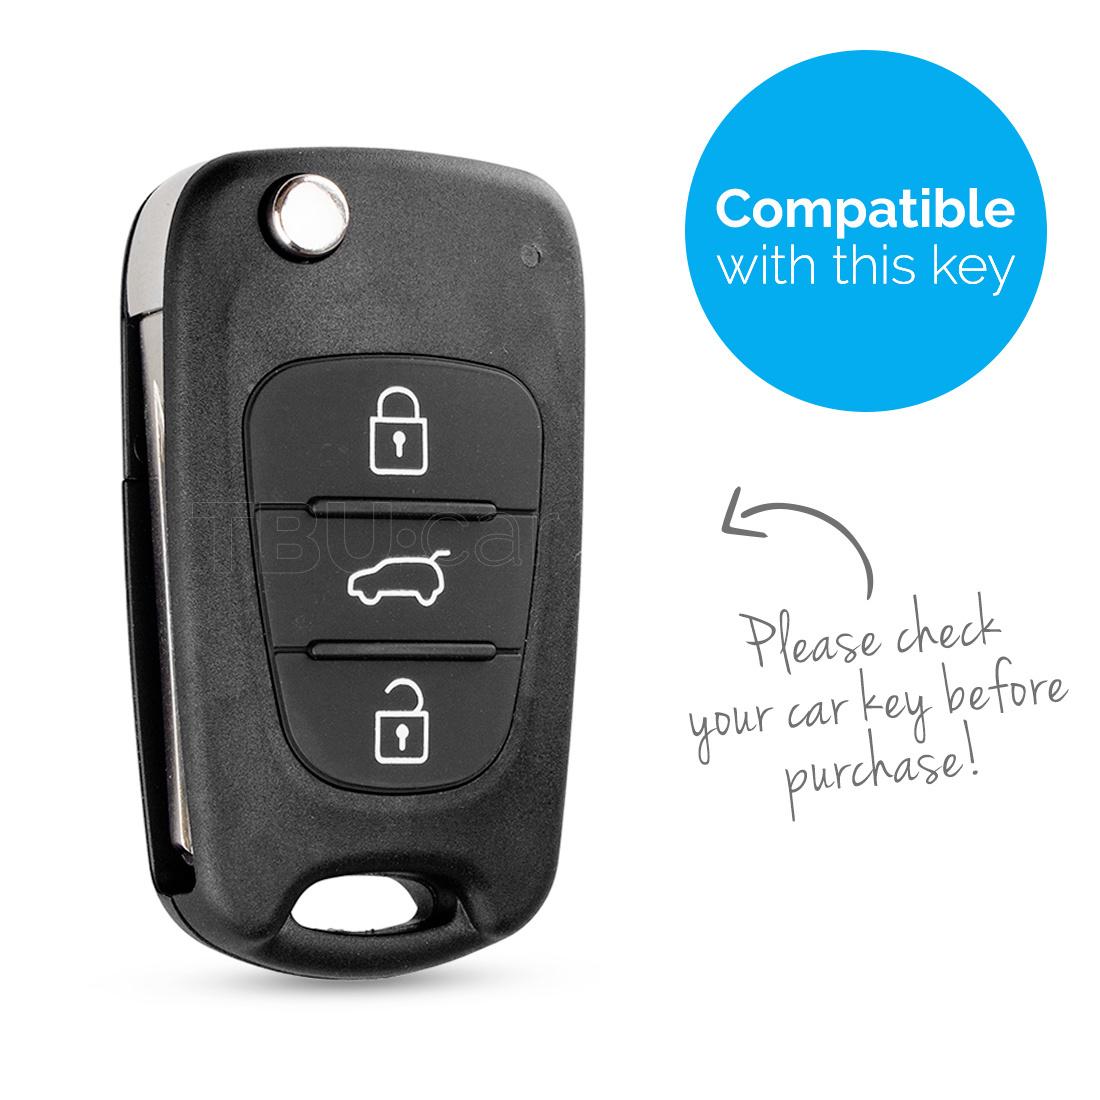 TBU car TBU car Autoschlüssel Hülle kompatibel mit Hyundai 3 Tasten - Schutzhülle aus Silikon - Auto Schlüsselhülle Cover in Lindgrün